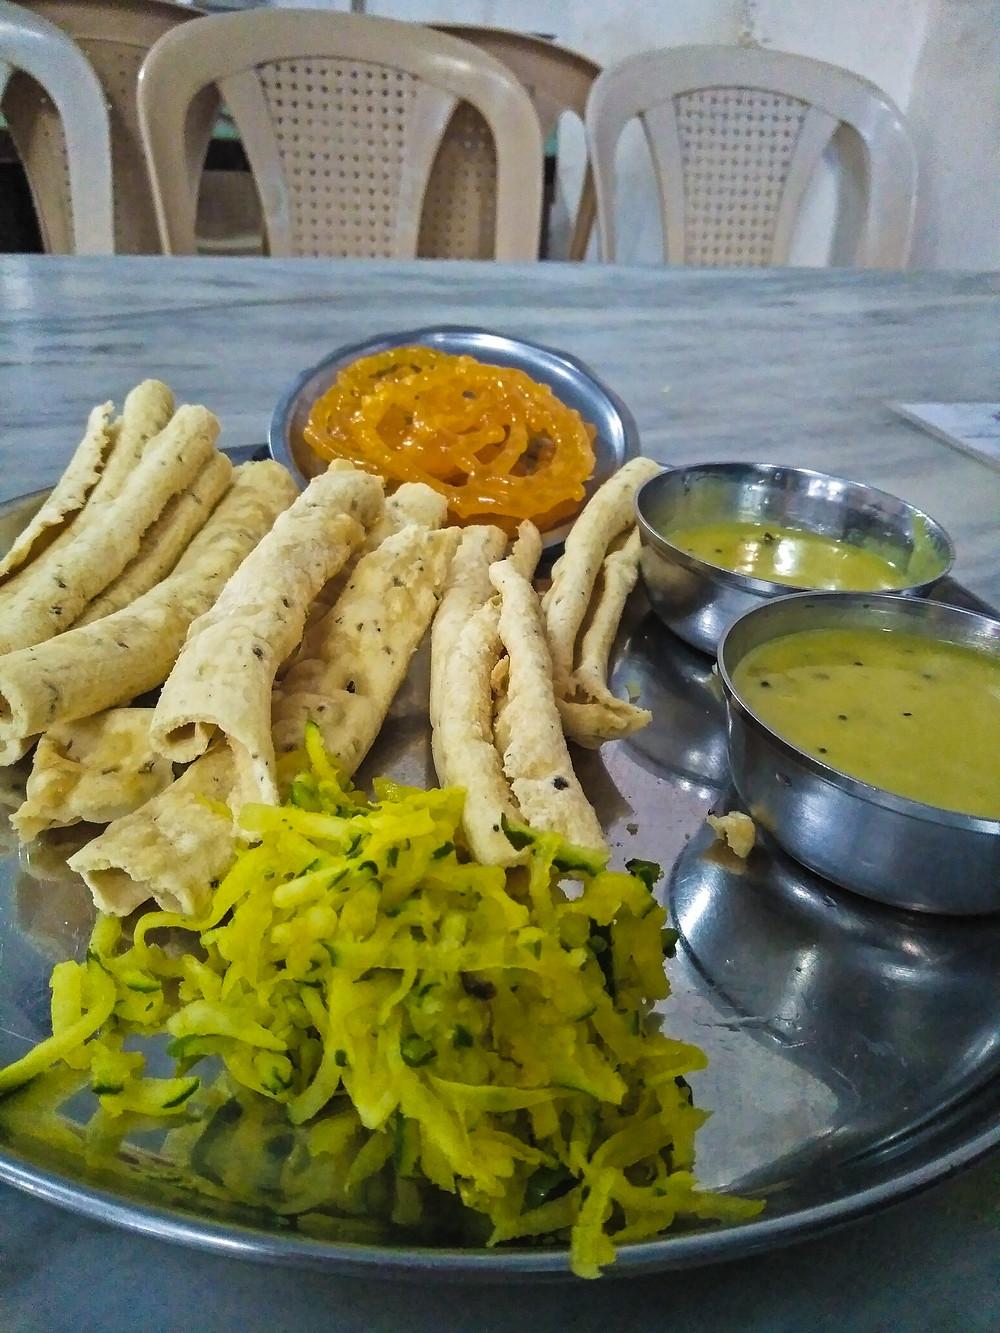 Jalebi fafda at Hotel Chandravilas